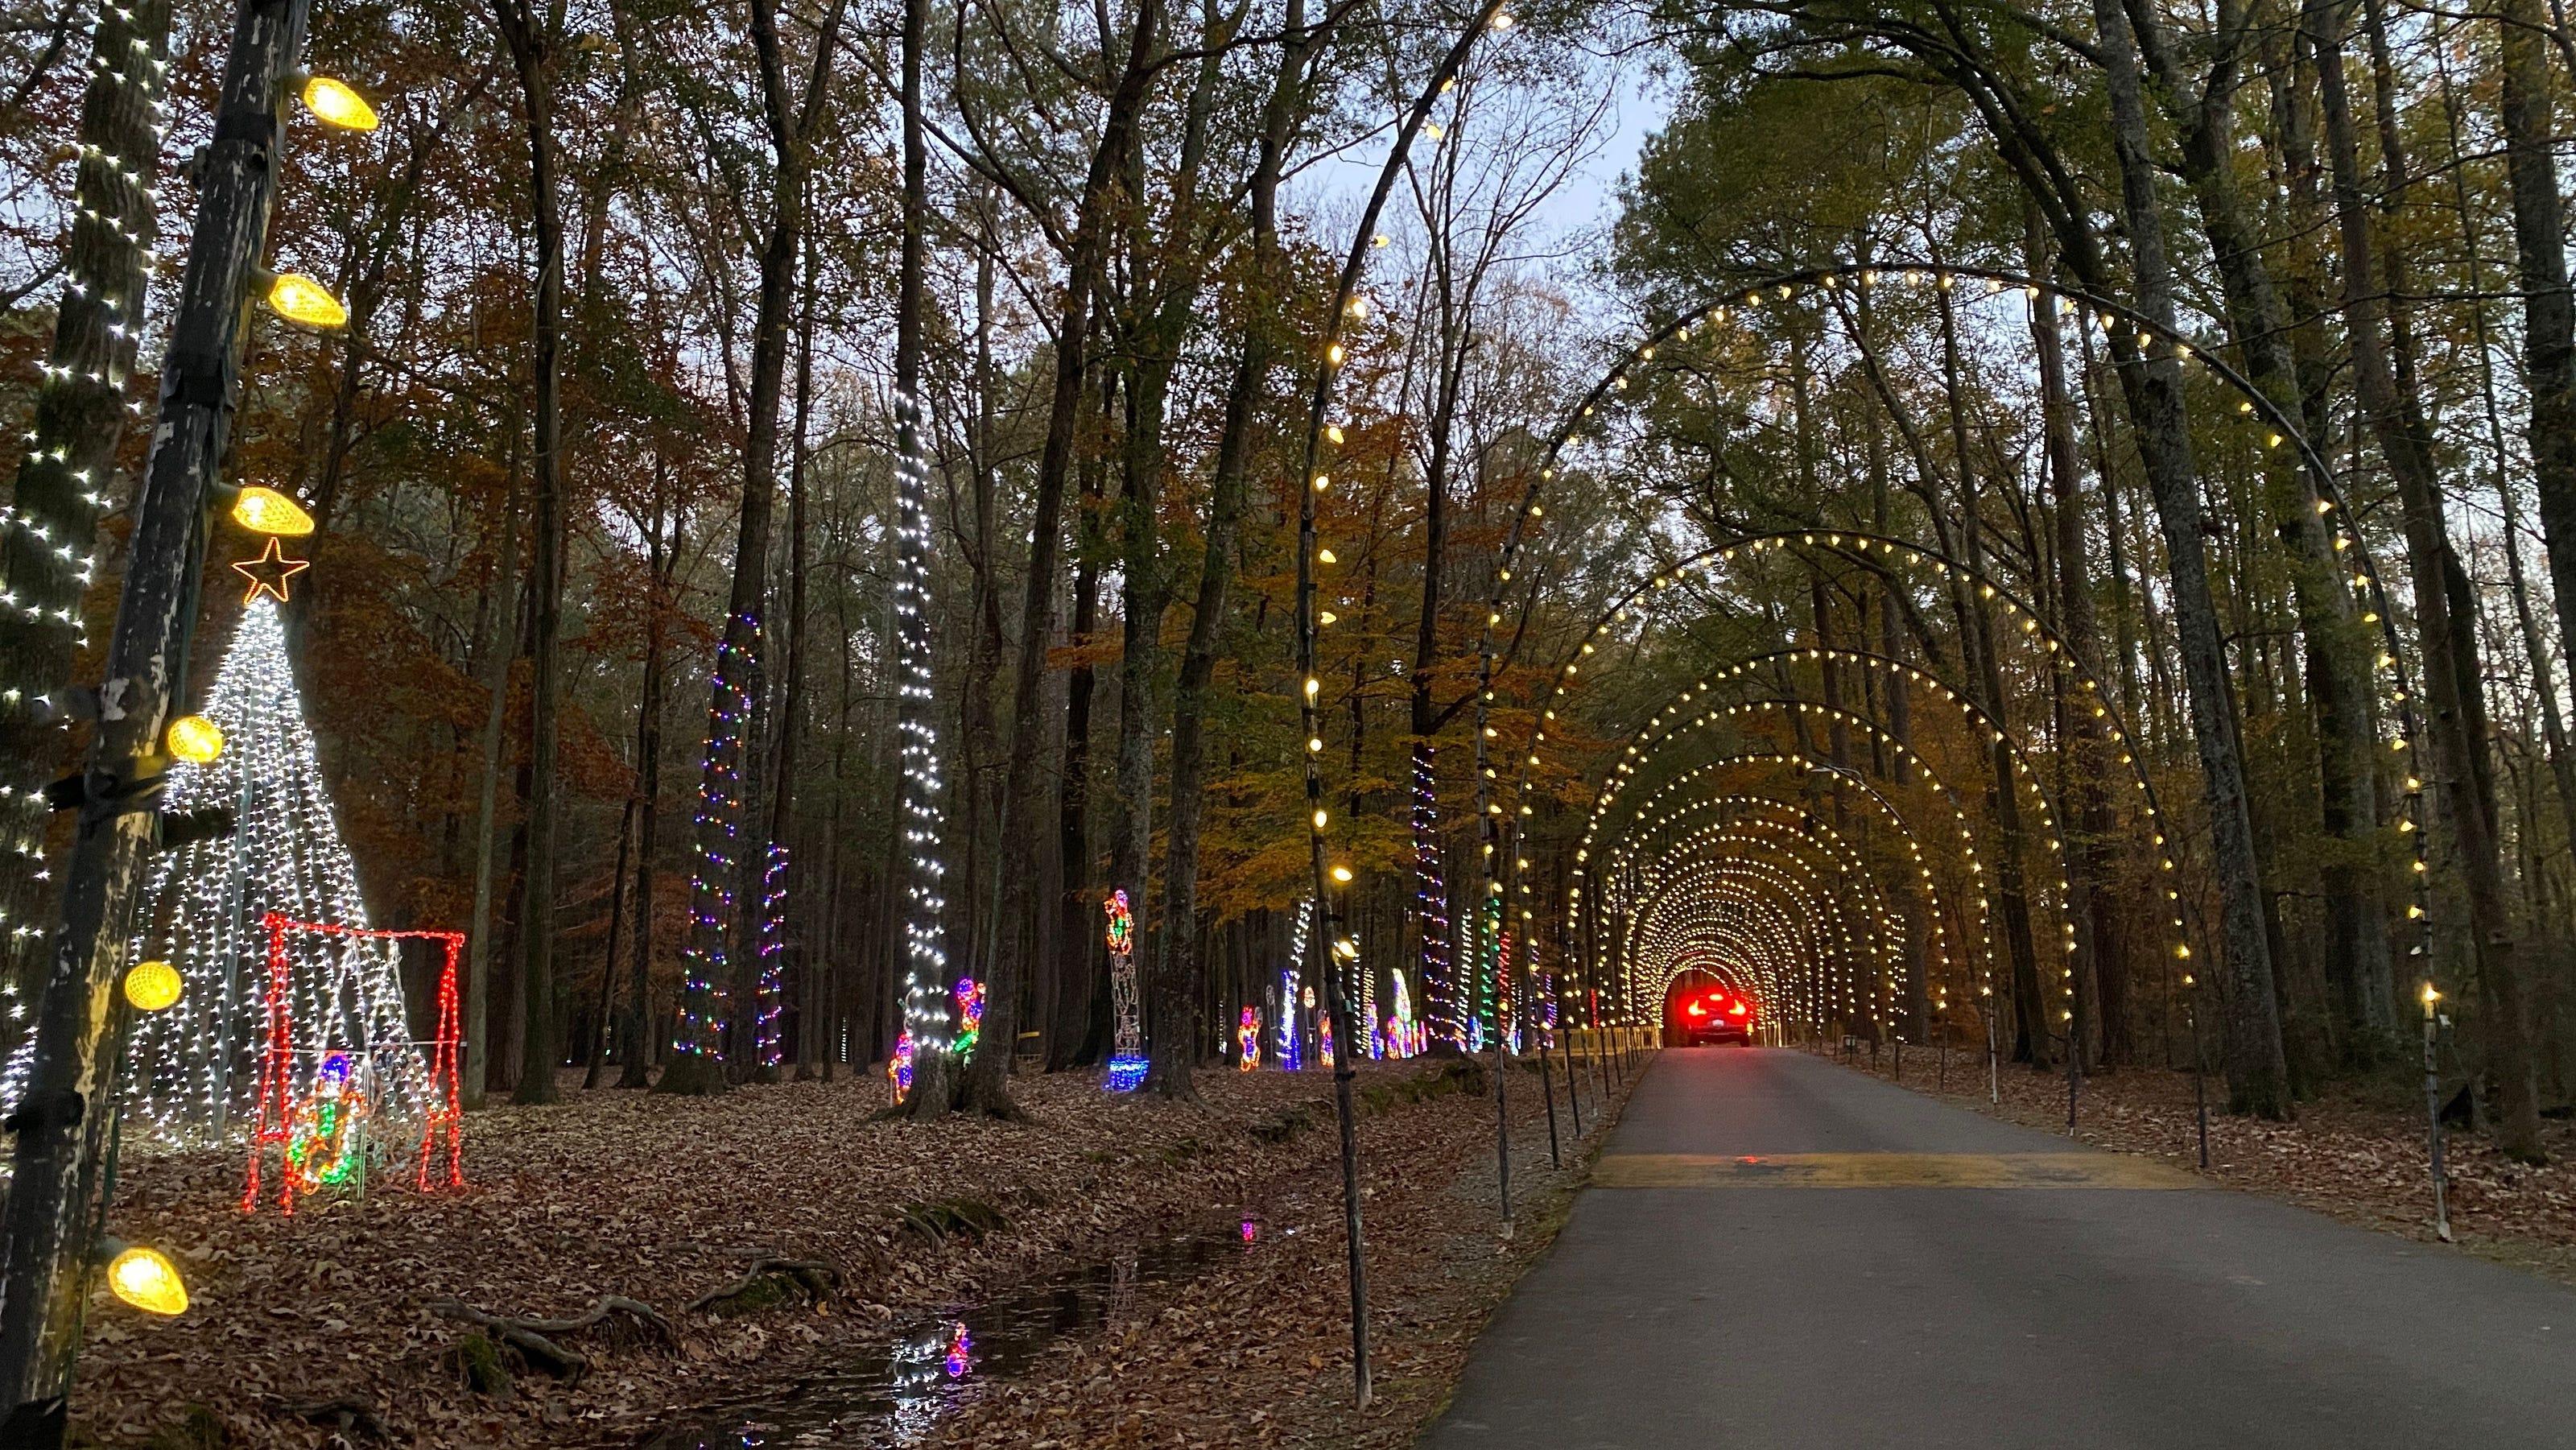 Fayetteville Nc Kinwood Christmas Lights 2021 Christmas Lights In The Fayetteville Area